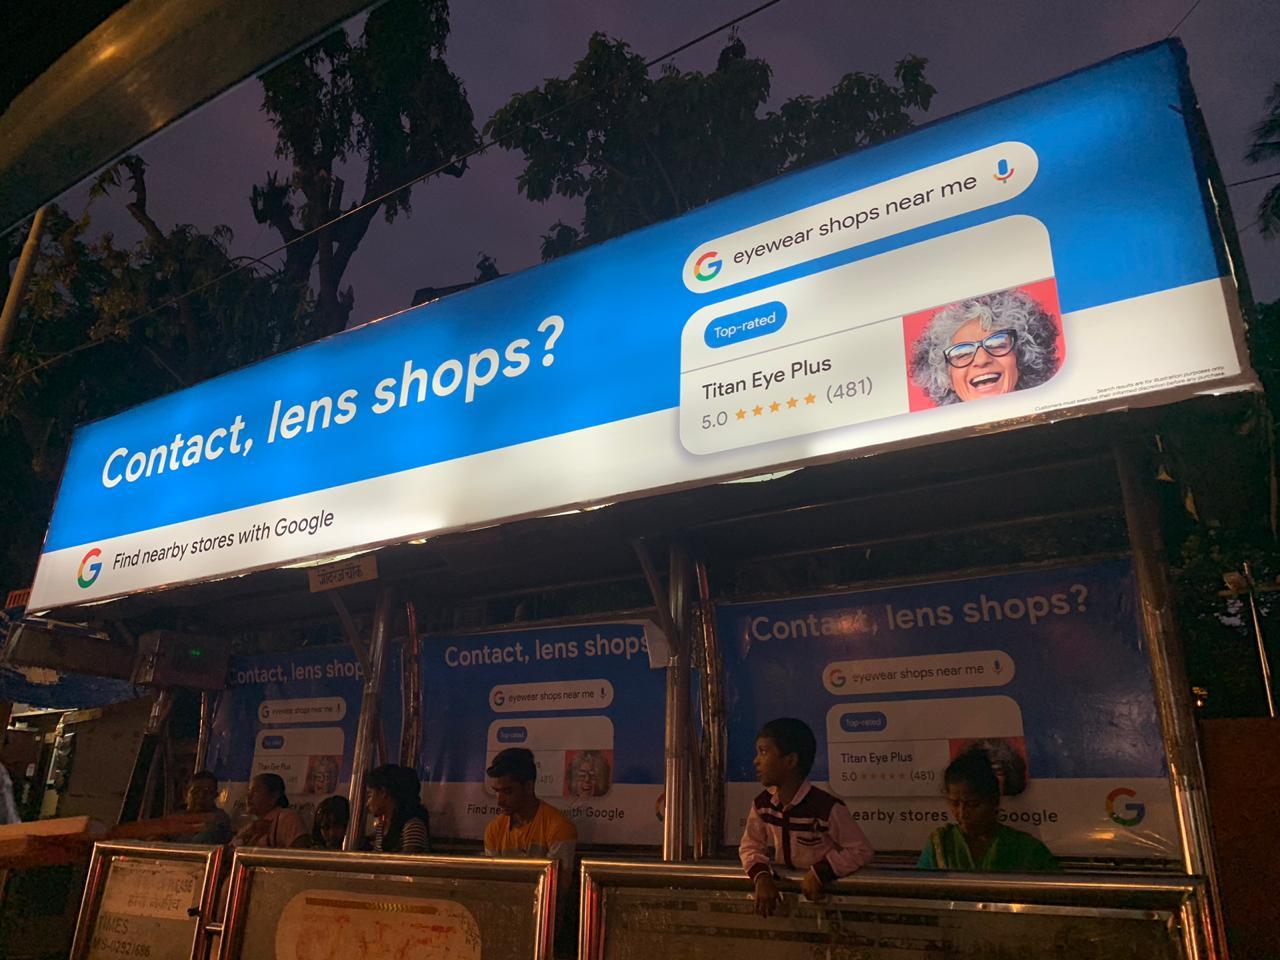 Google-Titan Eye Plus Bus Stop Ad